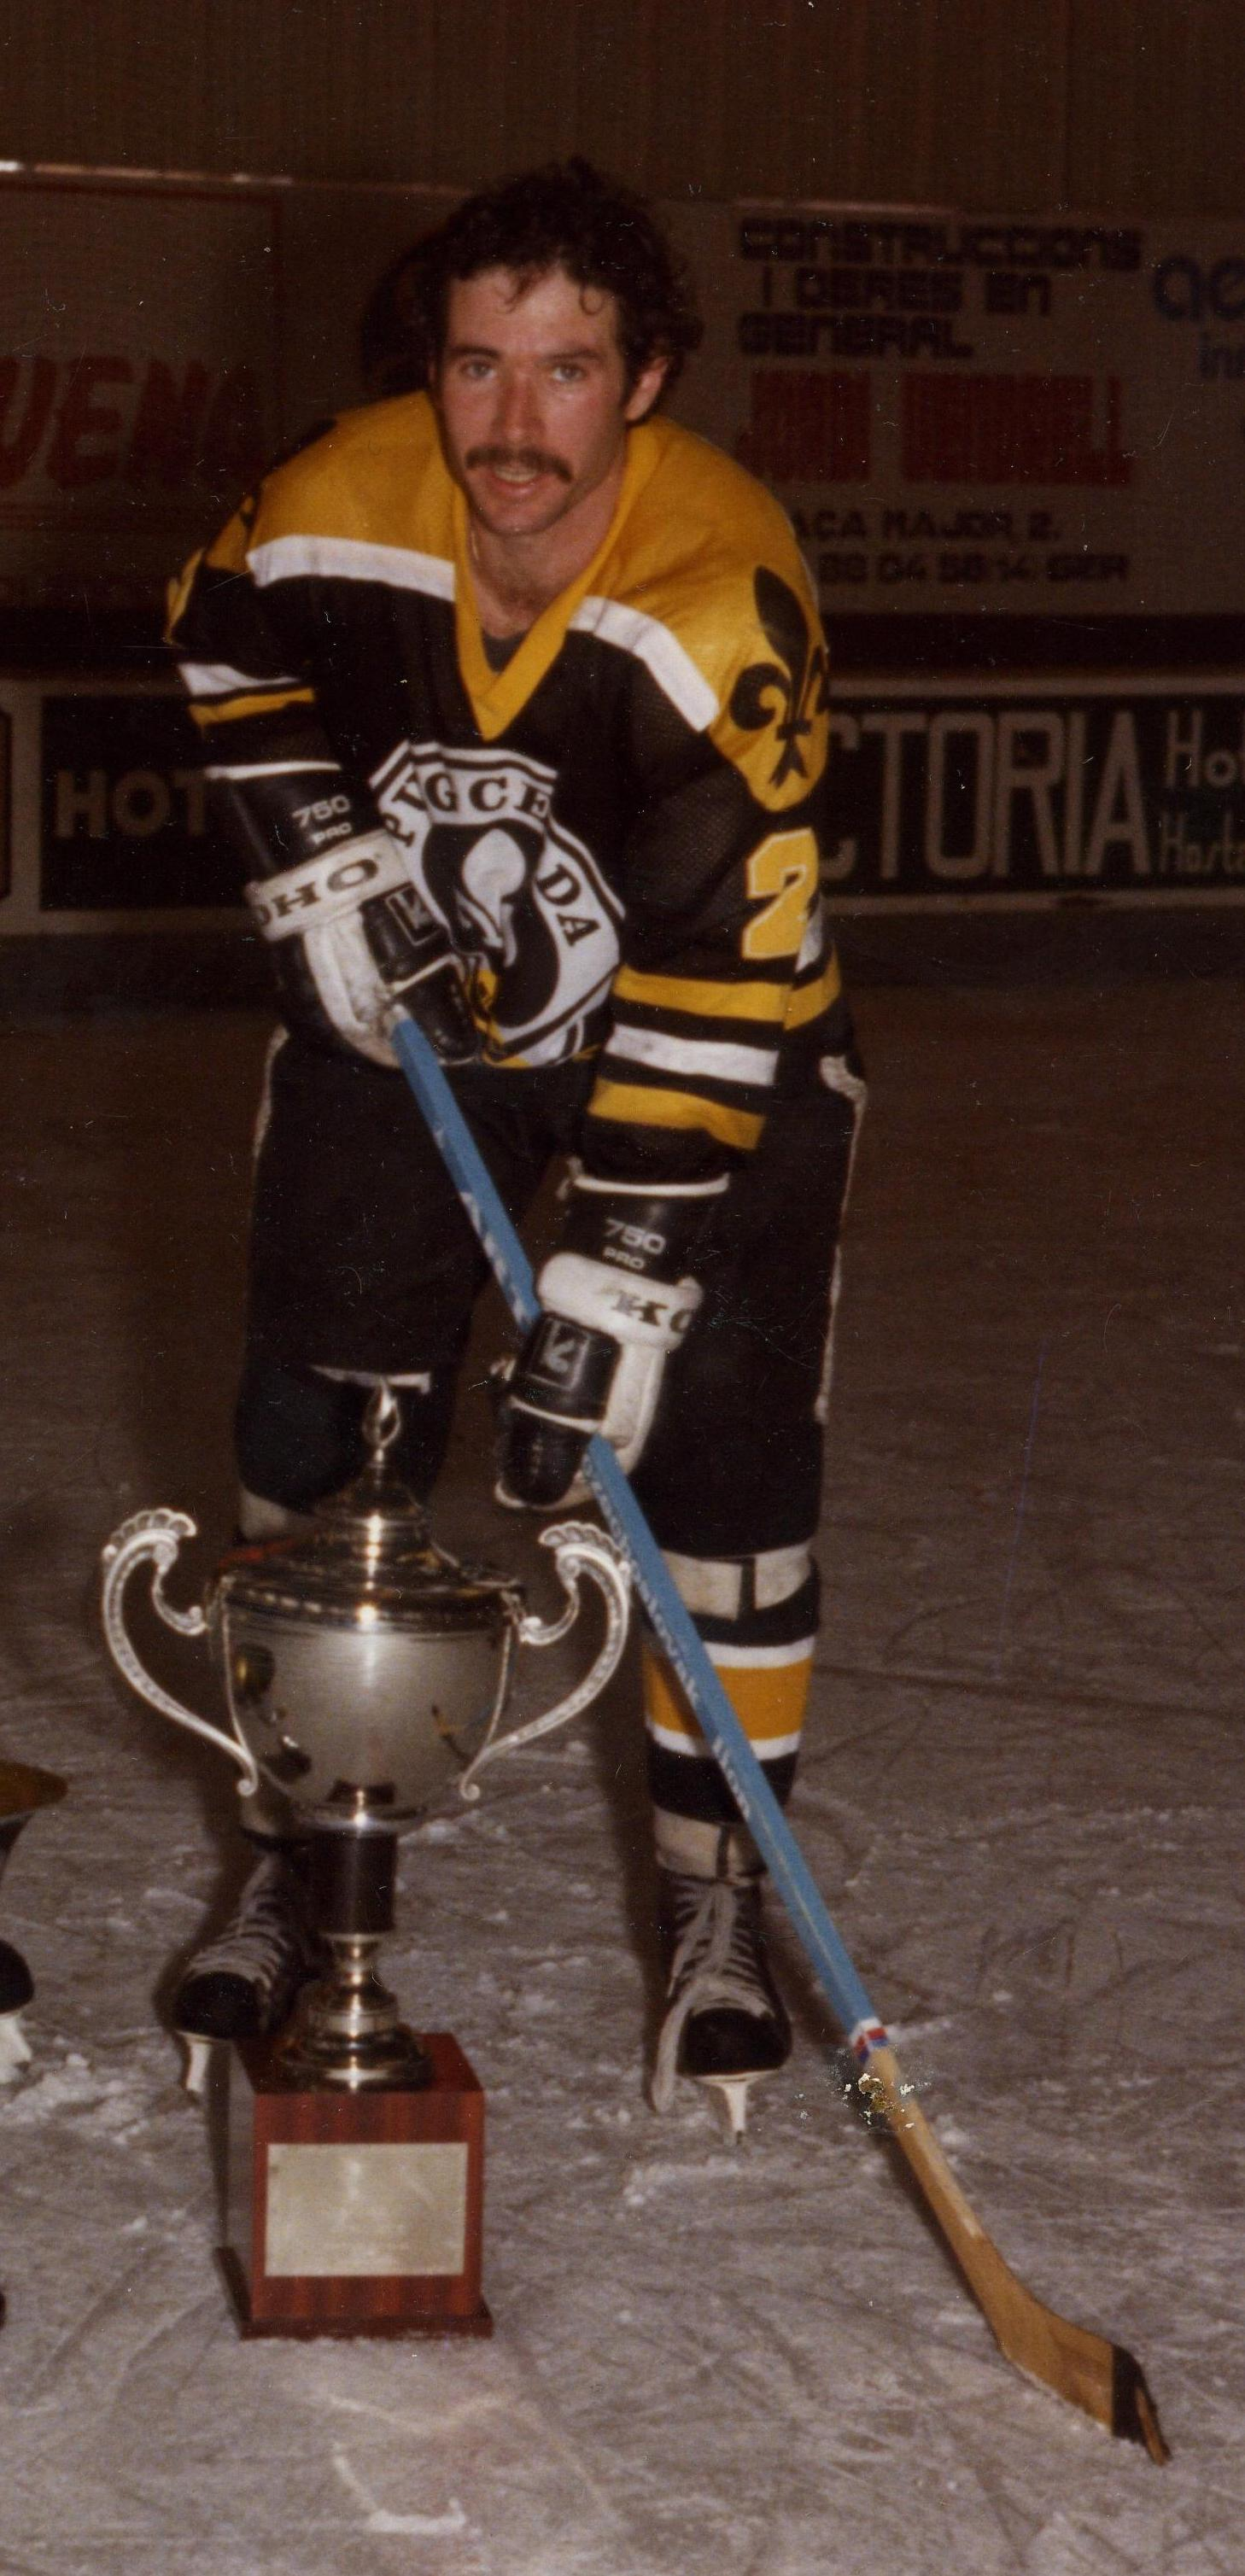 25-final-copa-del-rei-82-83